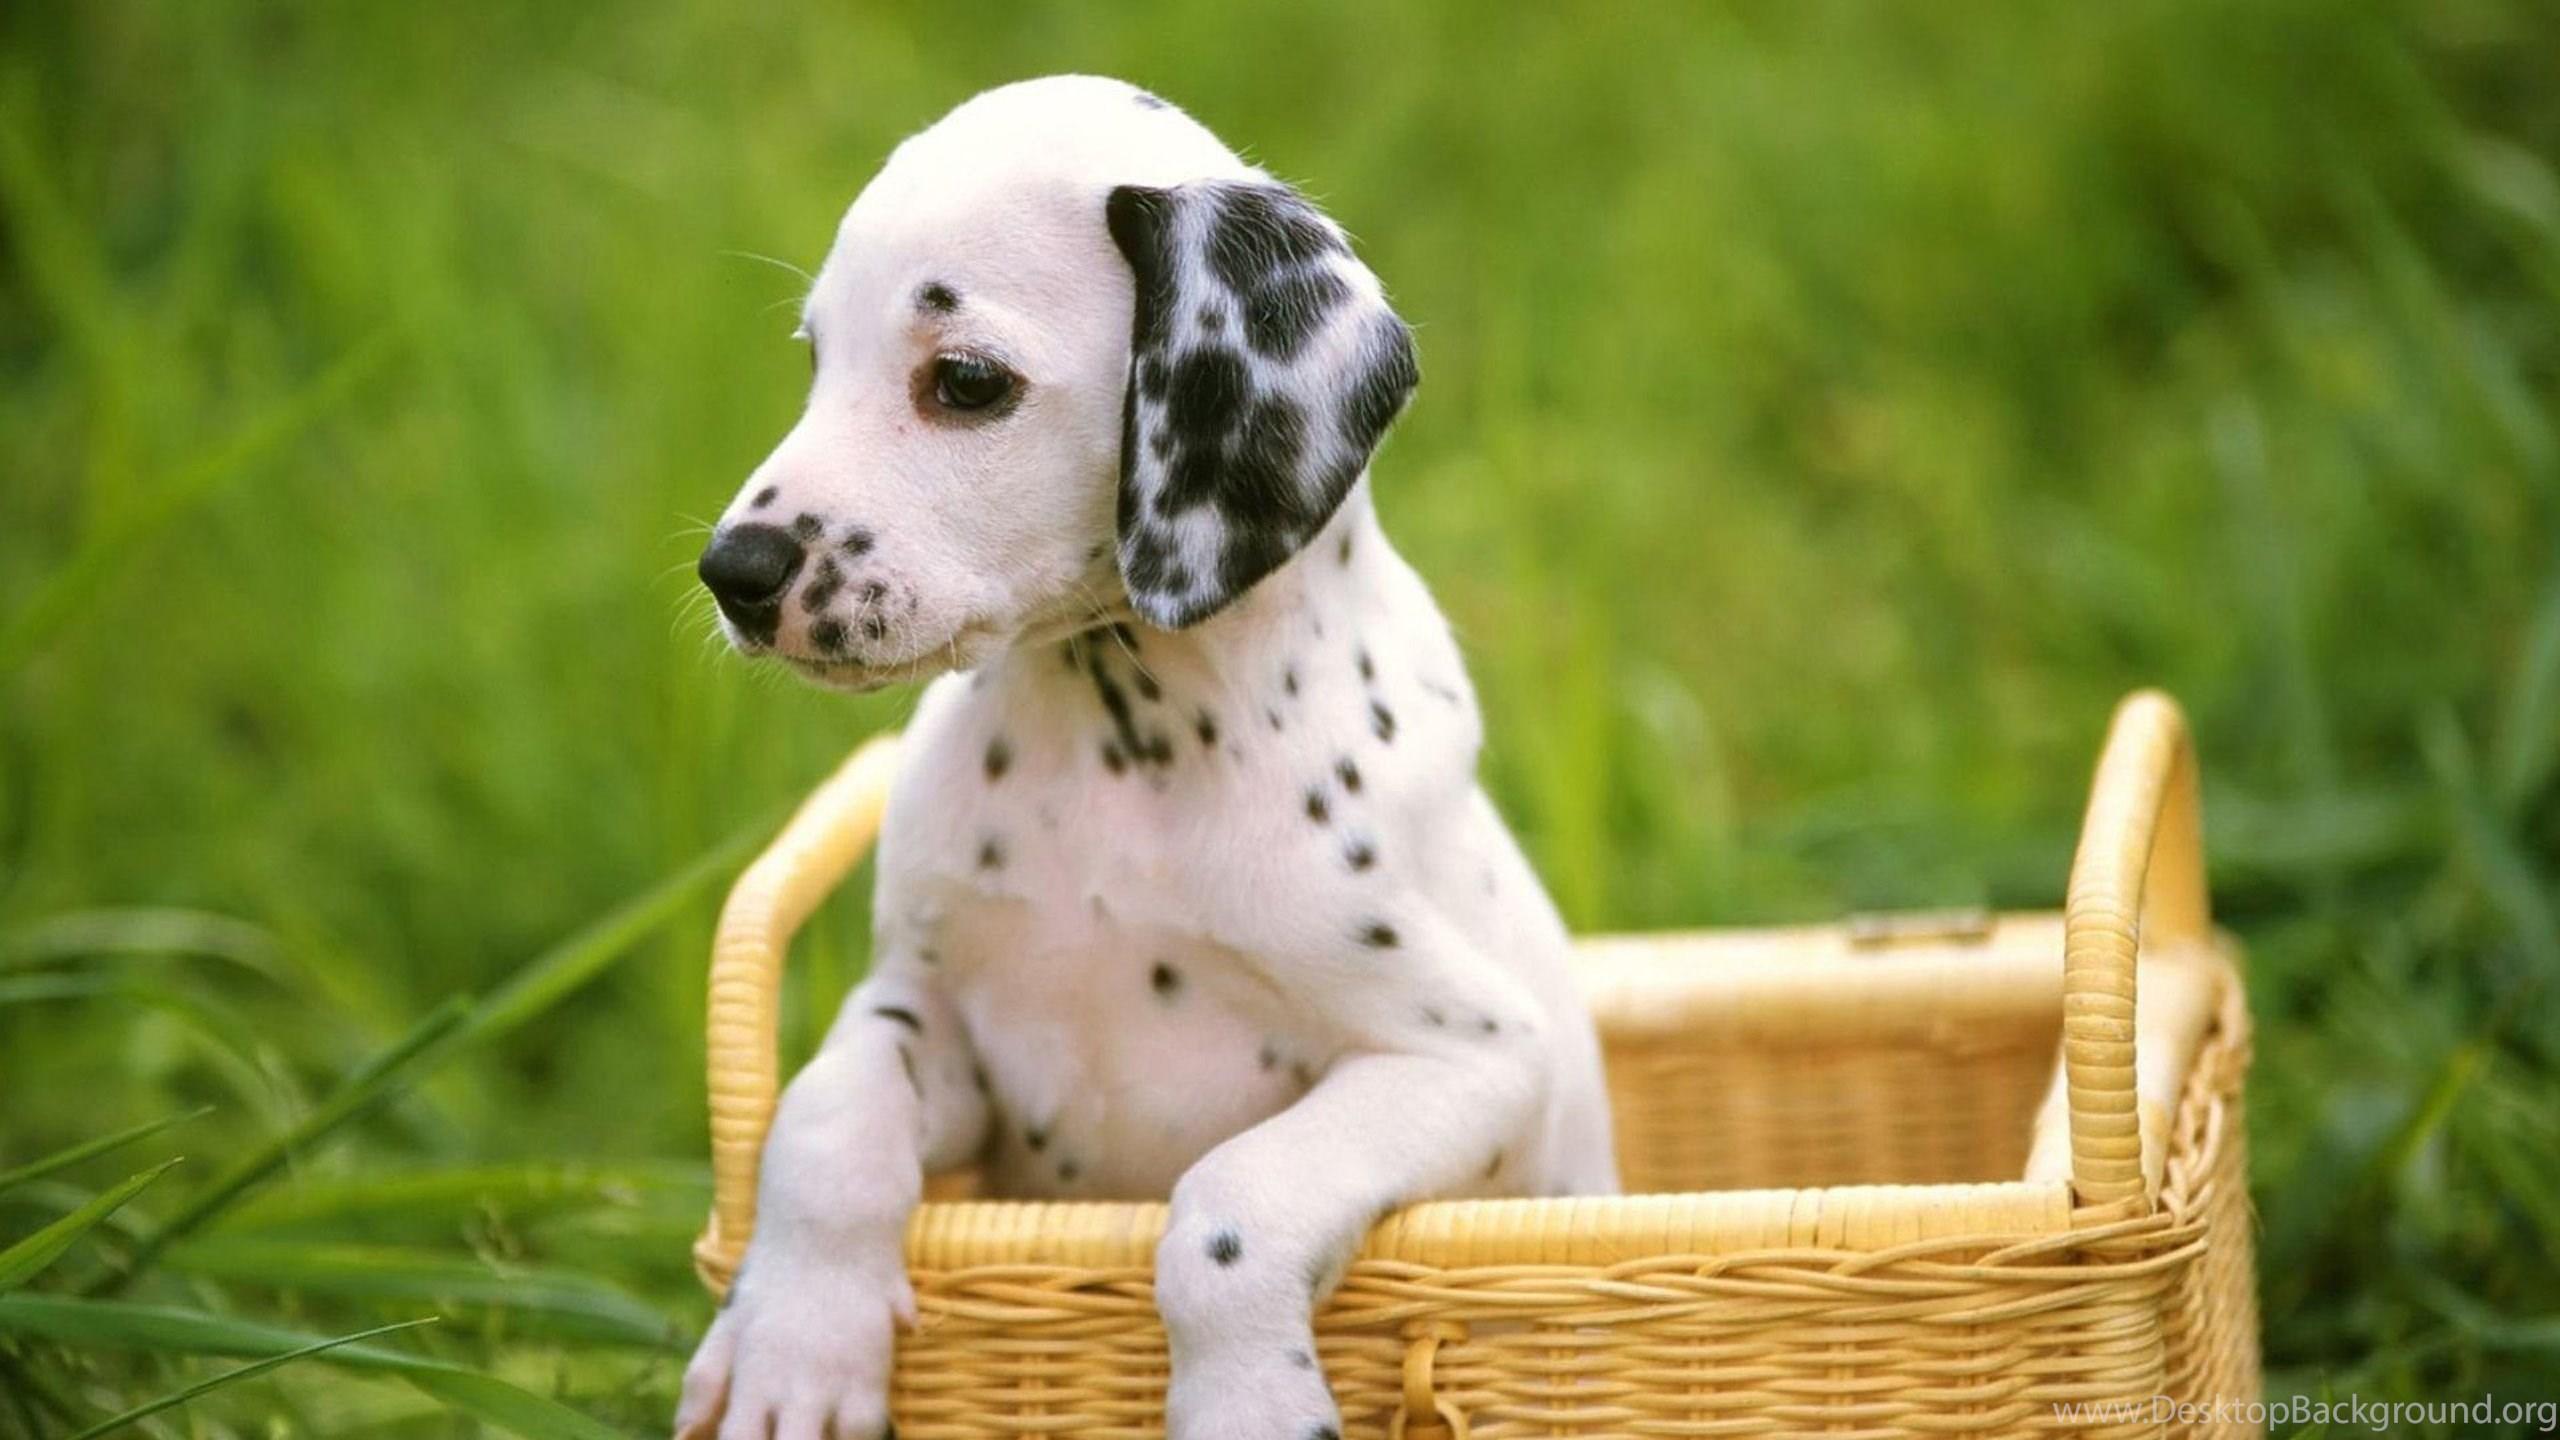 Cute Puppies Wallpapers HD Desktop PowerballForLife